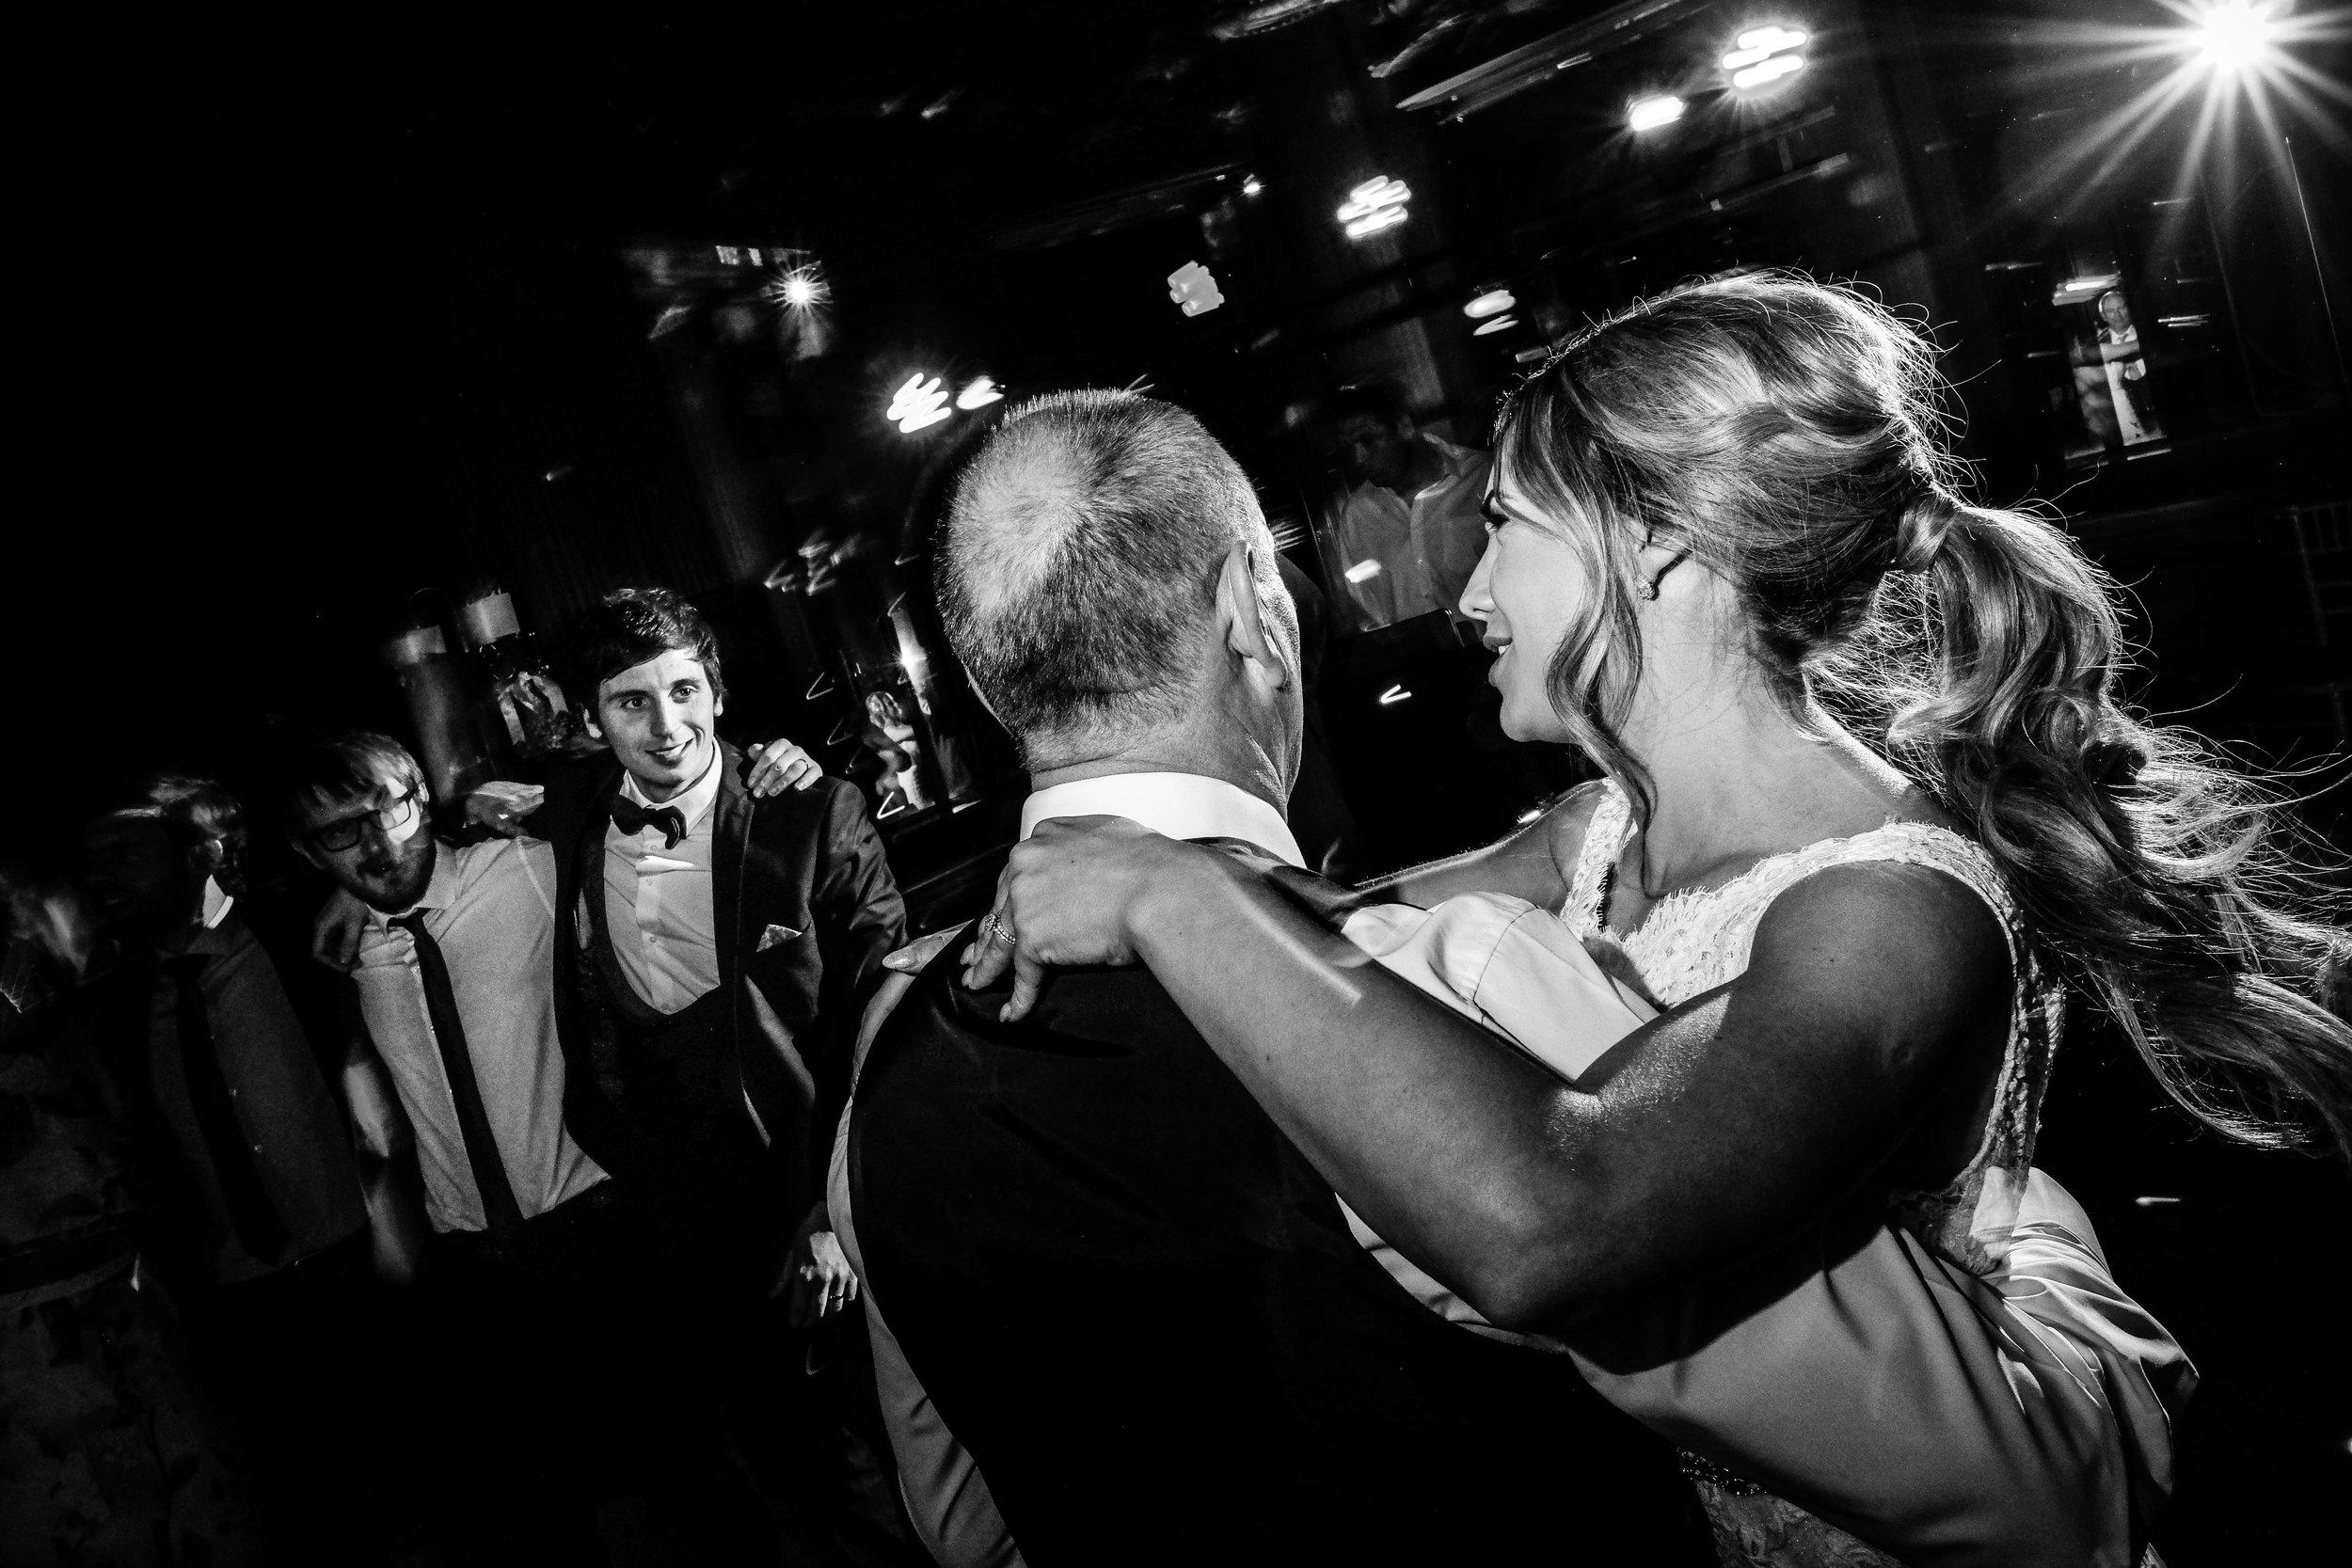 Thornton manor wedding photography cheshire wedding photographer liverpool manchester warrington chester wirral wedding BLOG (89 of 108).jpg